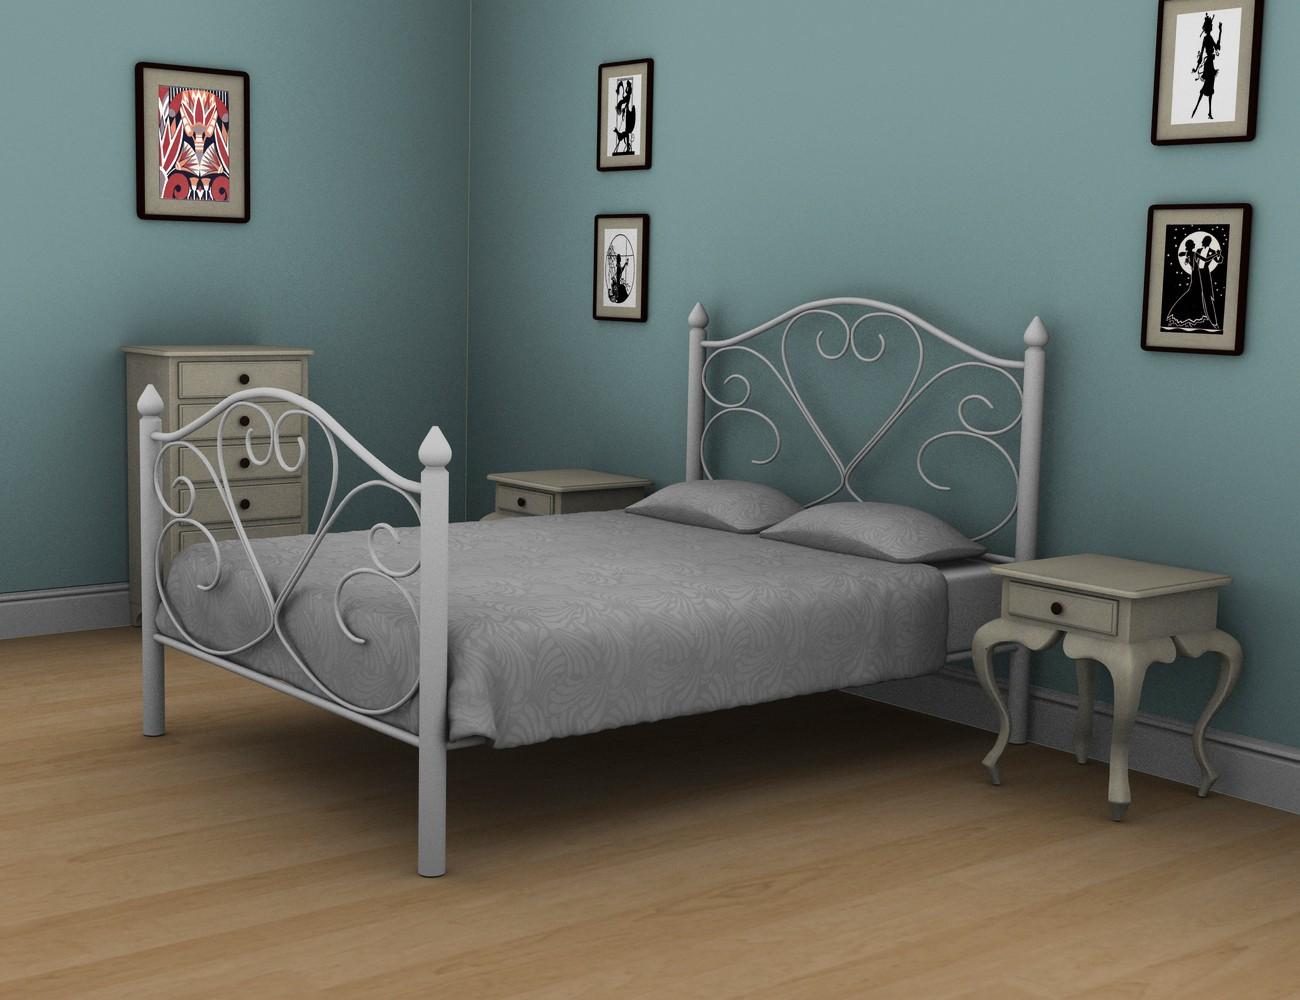 Download Daz Studio 3 For Free Daz 3d Bedroom Furniture